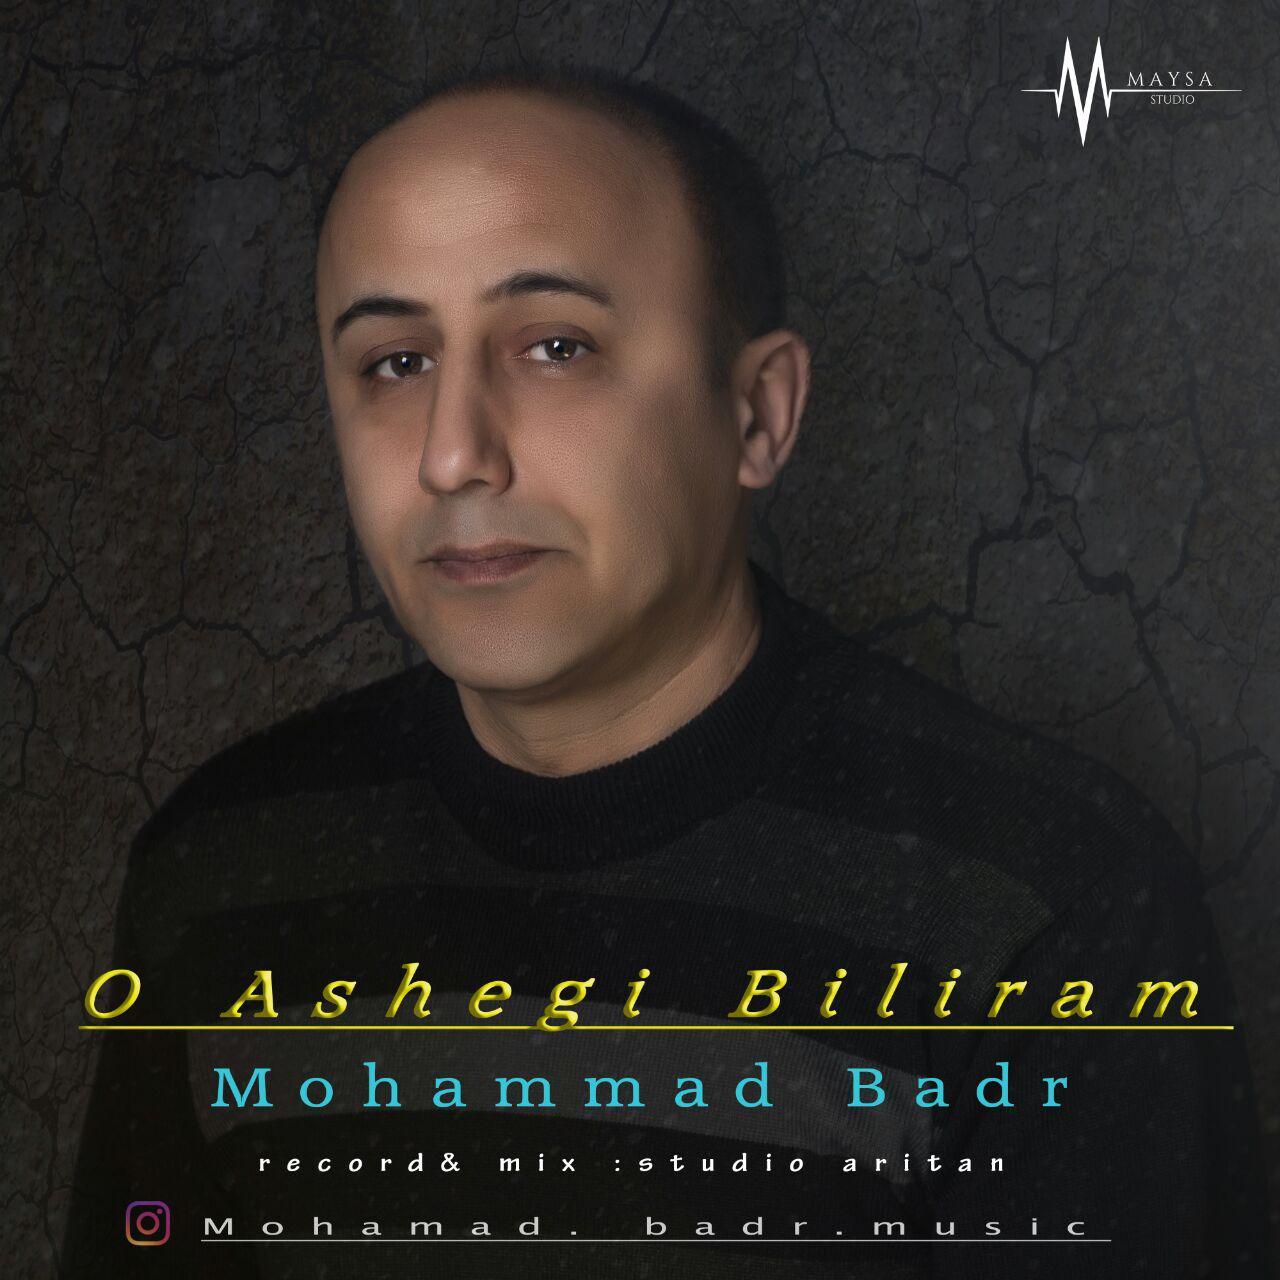 http://s3.picofile.com/file/8364169450/13Mohammad_Badr_O_Asheghi_Biliram.jpg